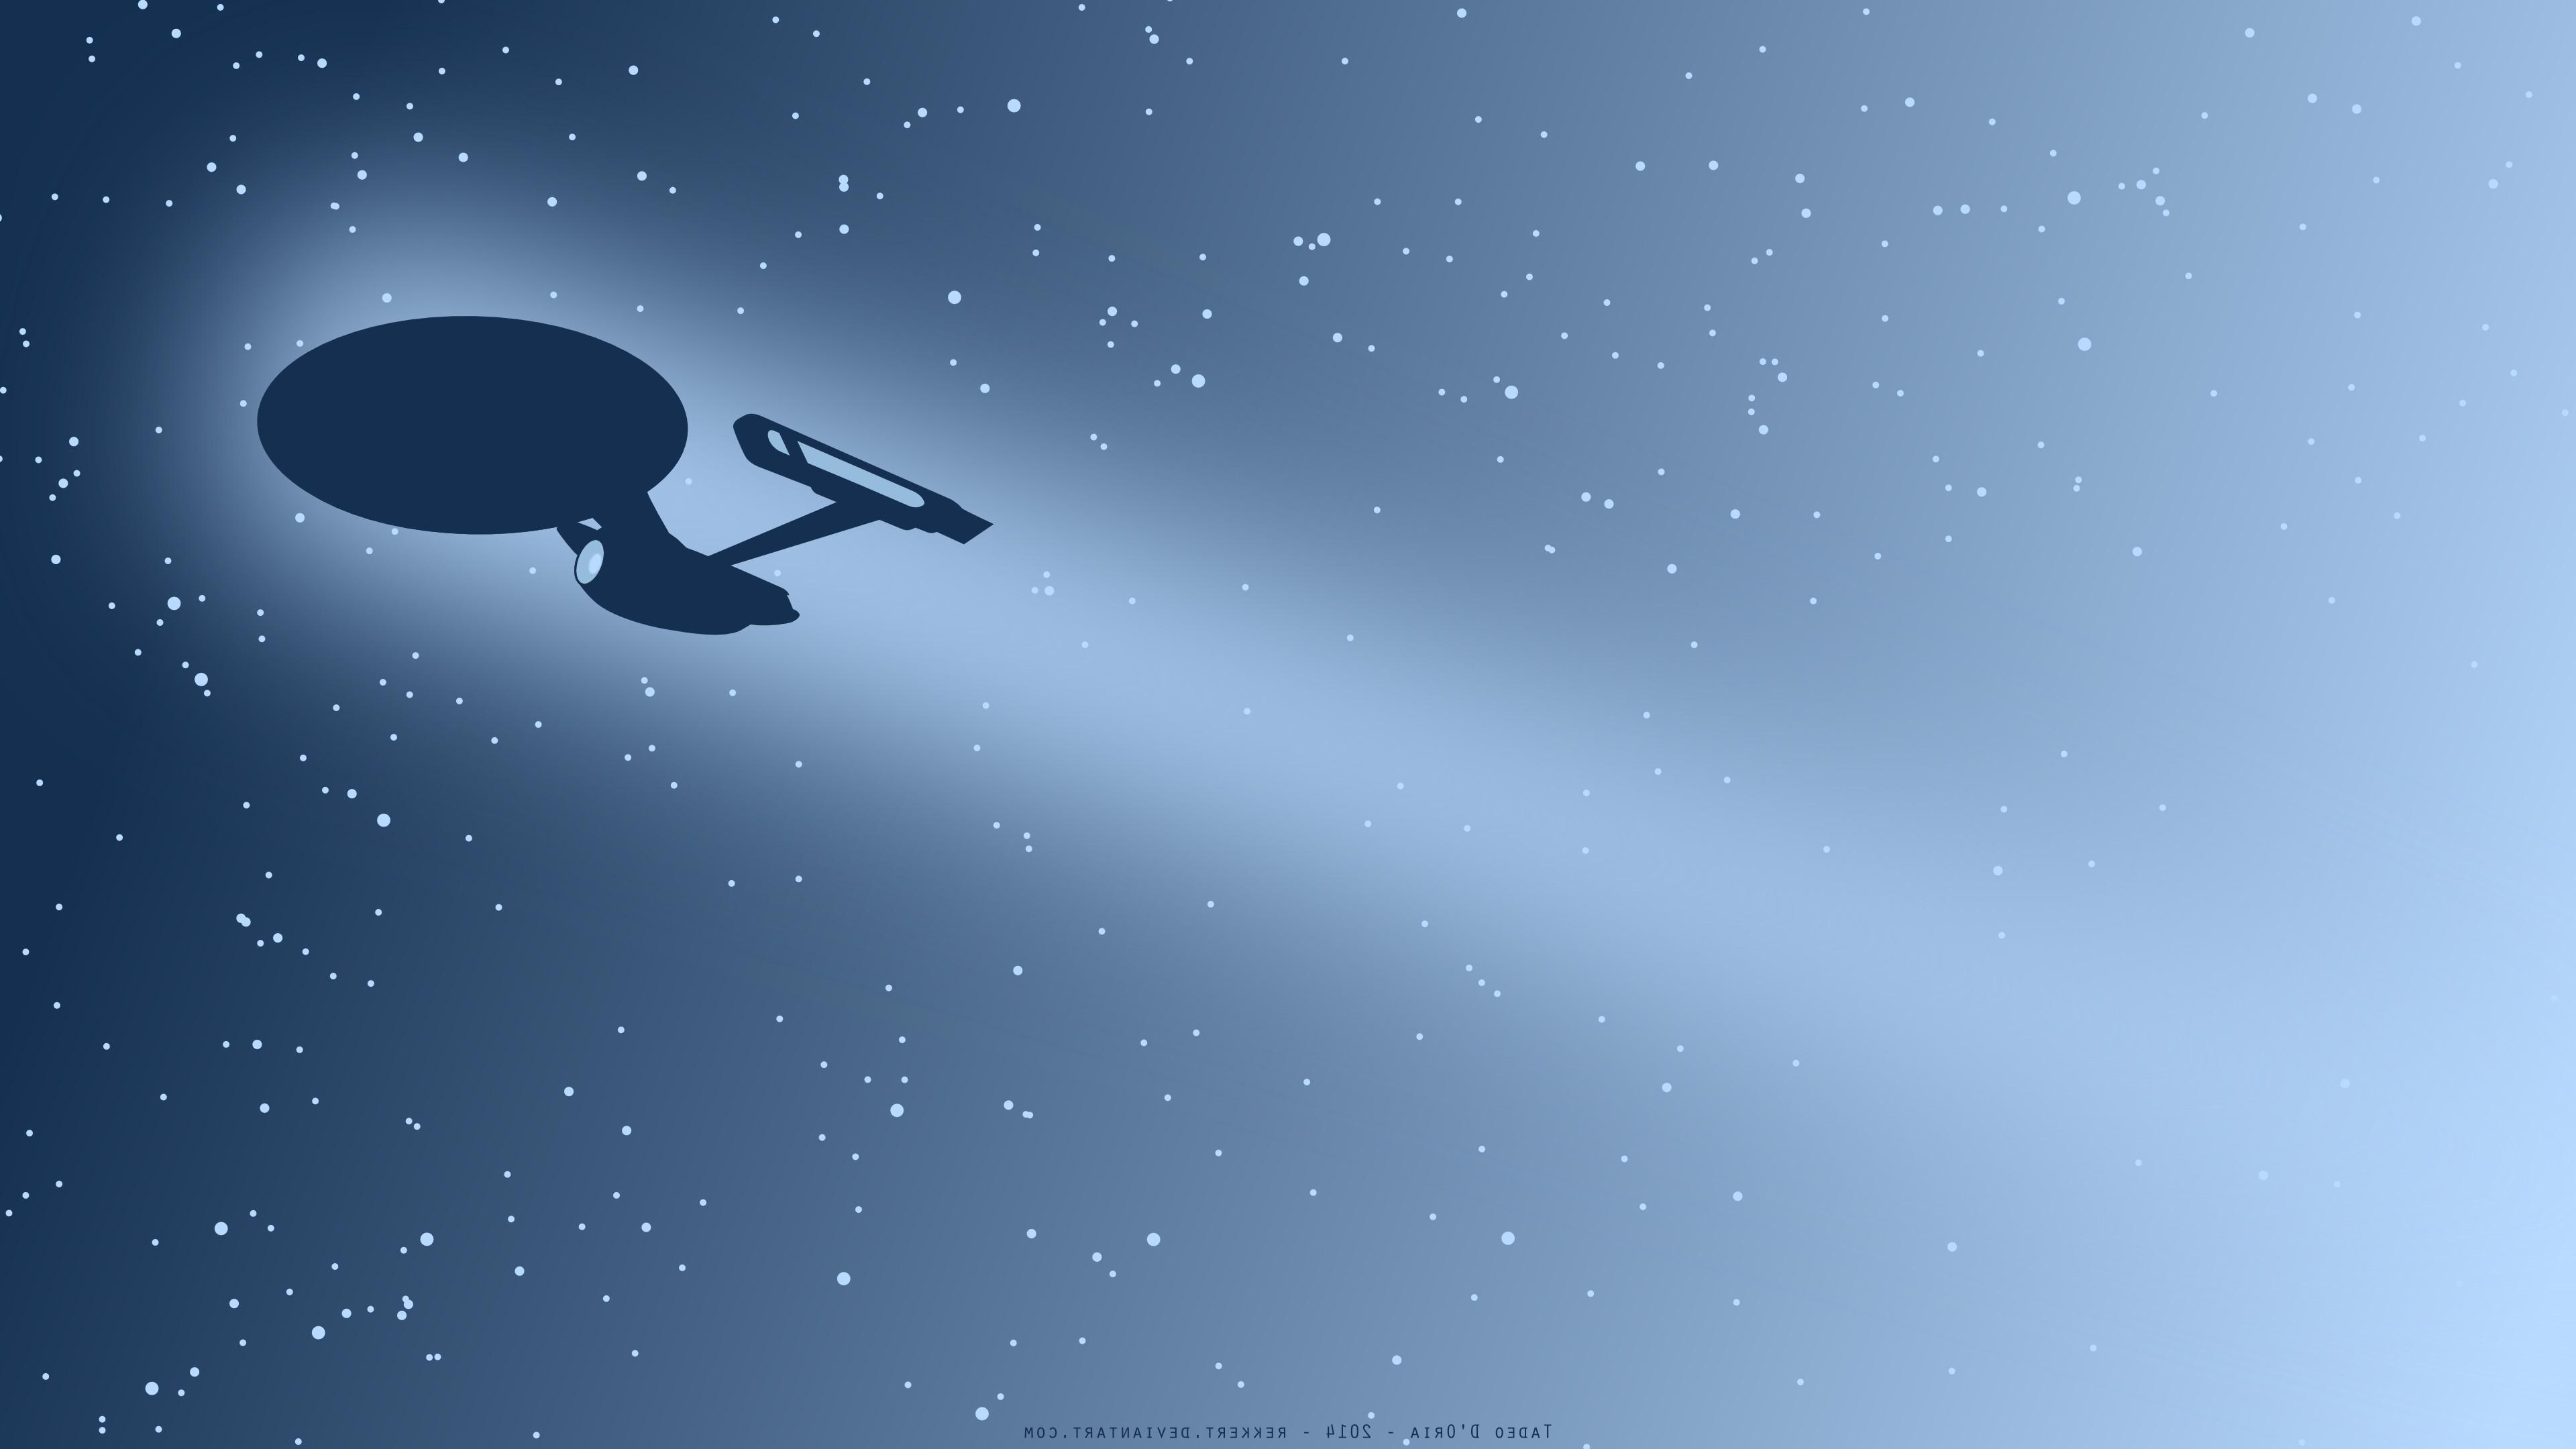 136 Star Trek Enterprise Wallpaper Hd